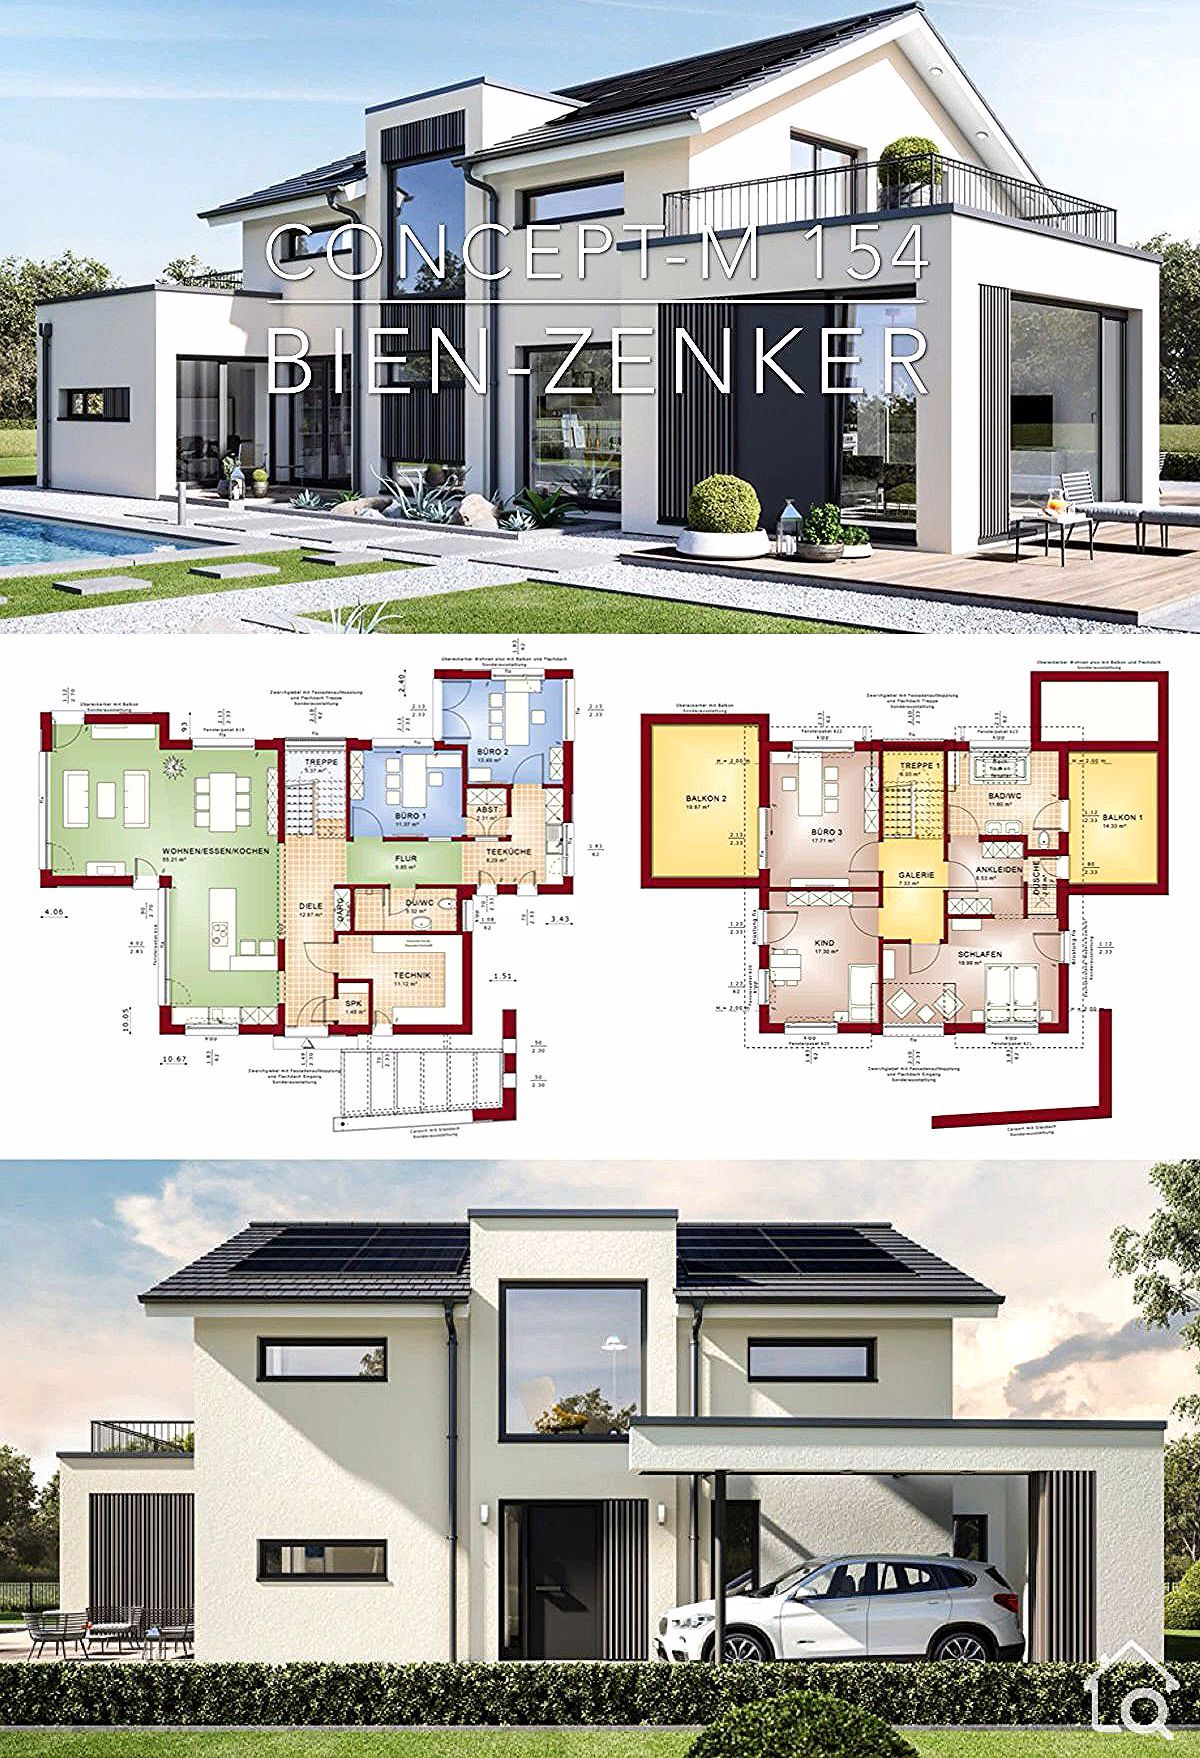 Modern Architecture House Plans Design Concept M 154 Dream House Plan Ideas In 2020 Modern Architecture House Architectural House Plans Modern Architecture Interior